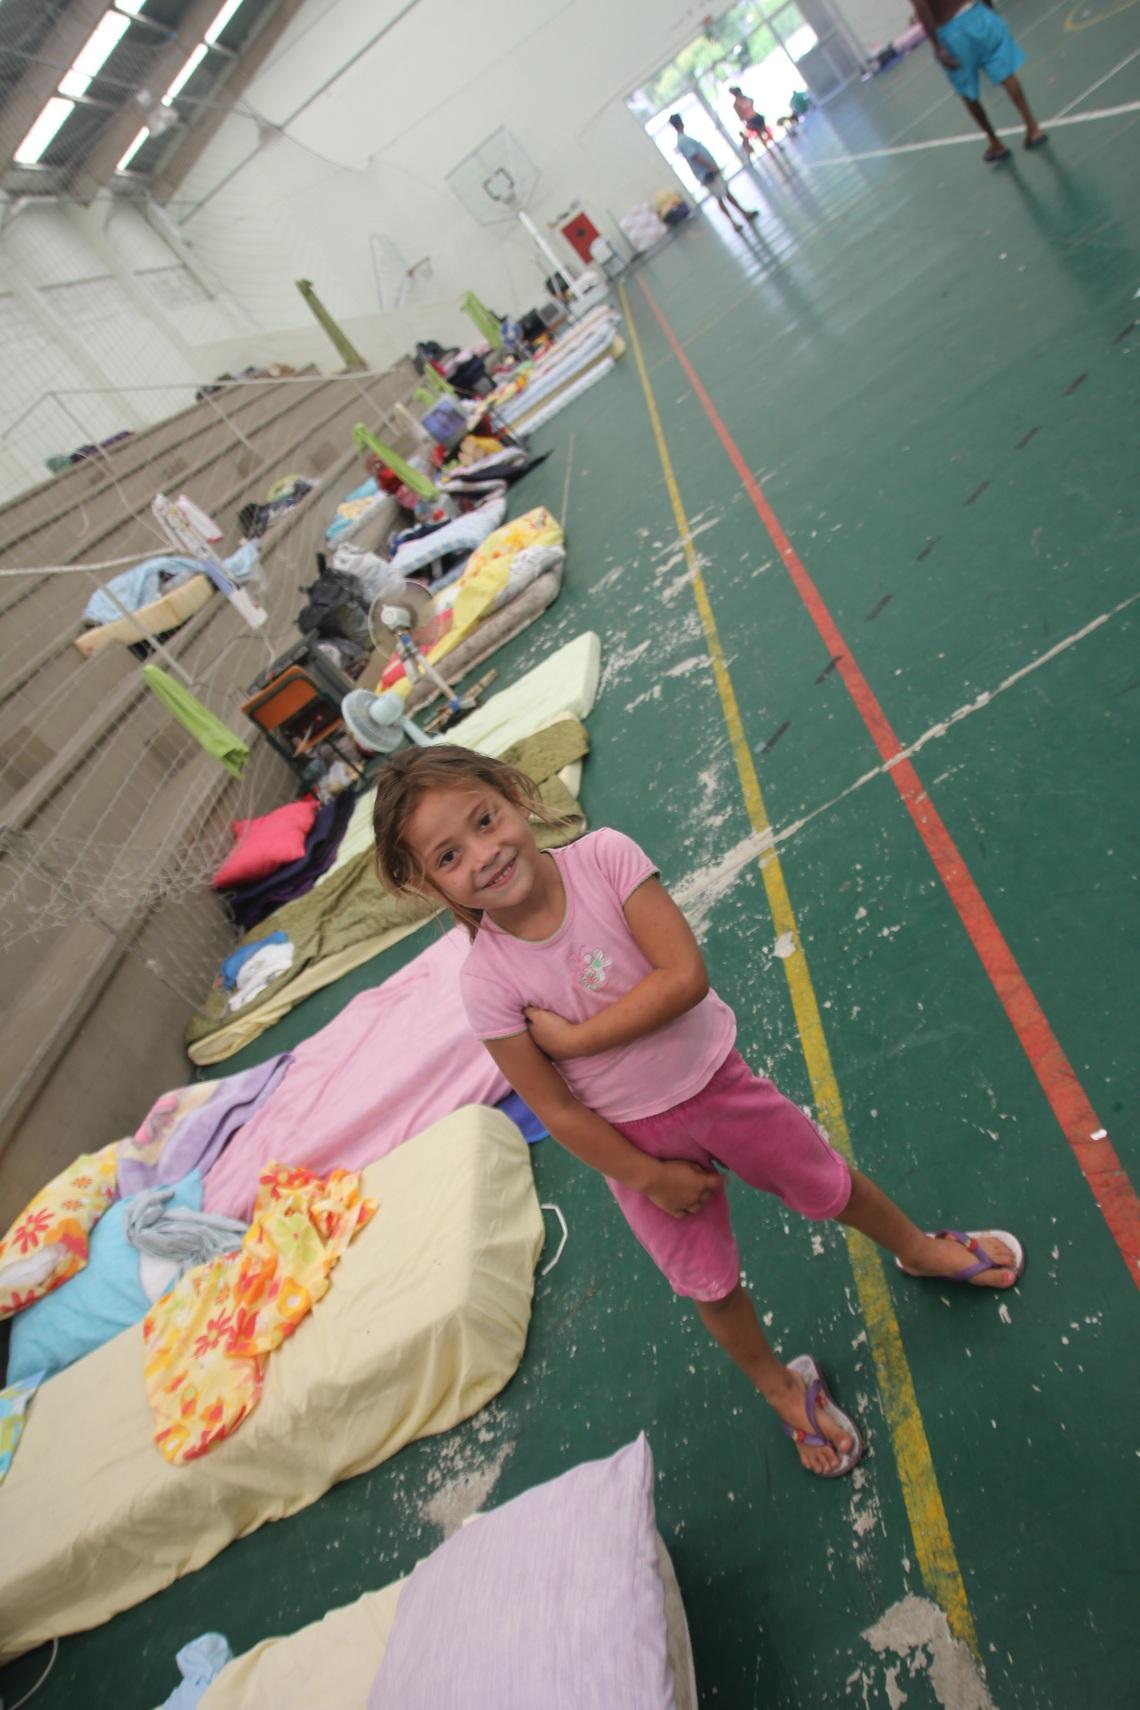 temporary shelter in gymnastics hall